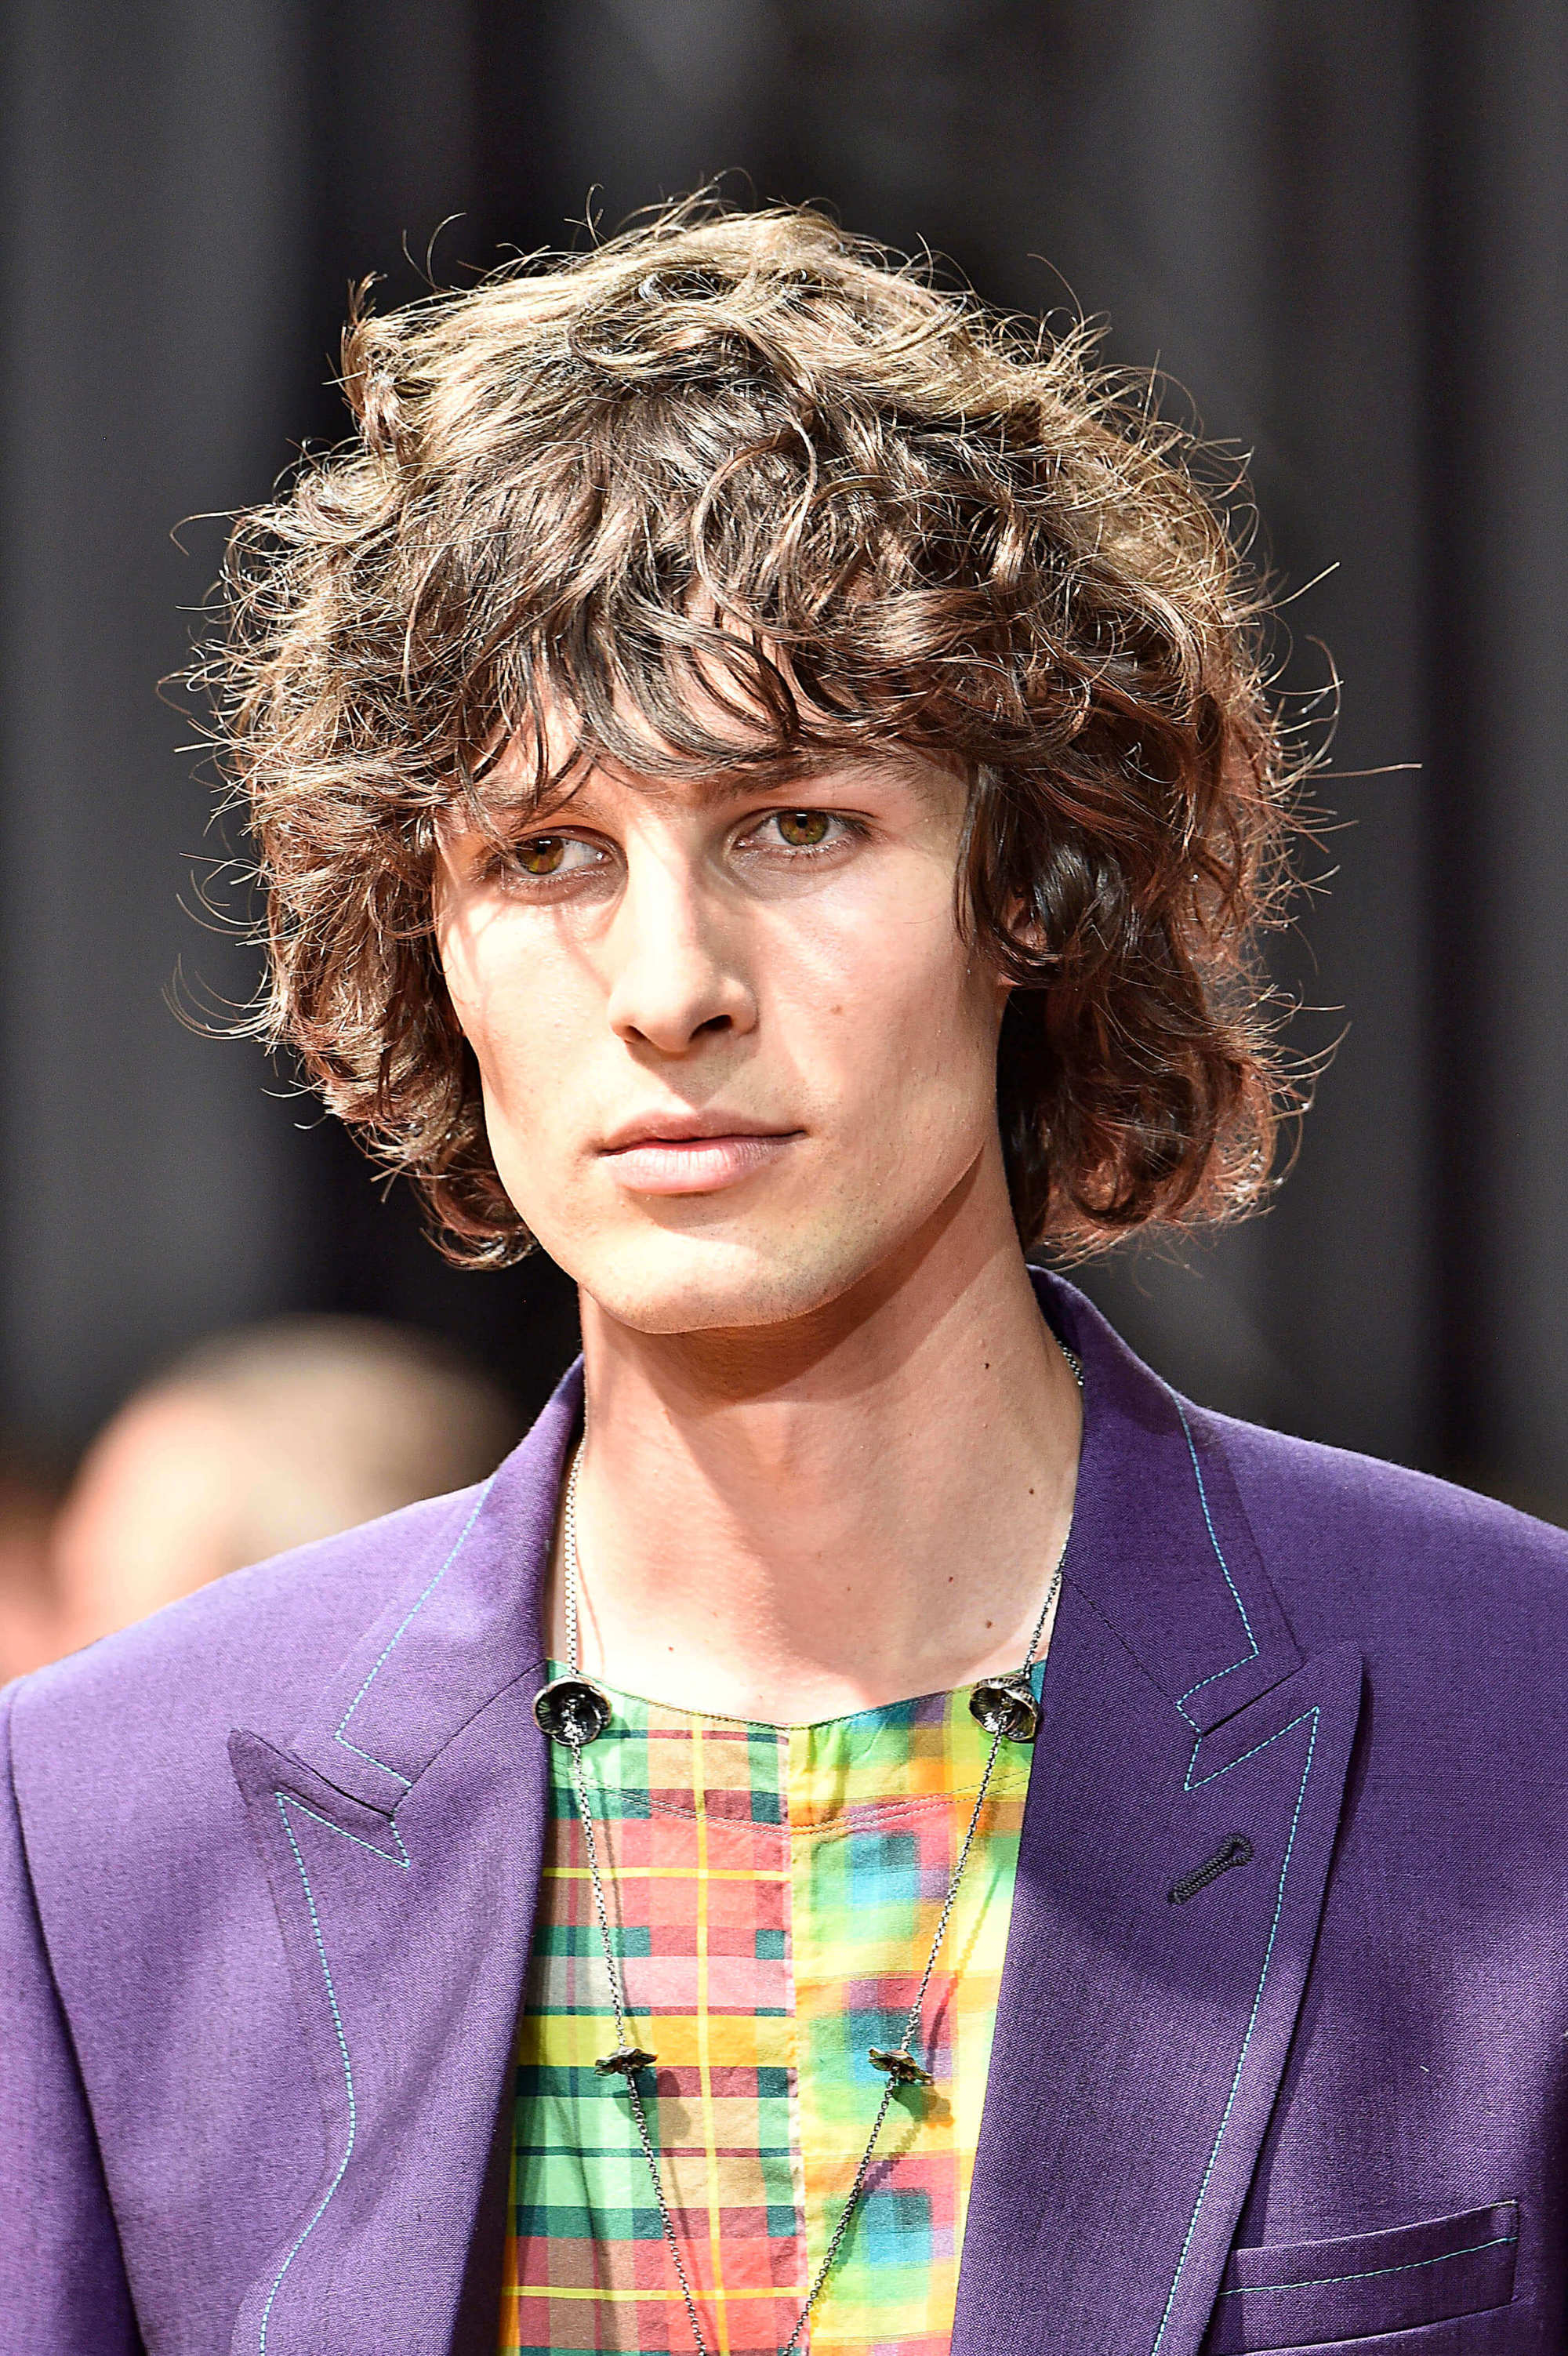 style men's curls in a shag